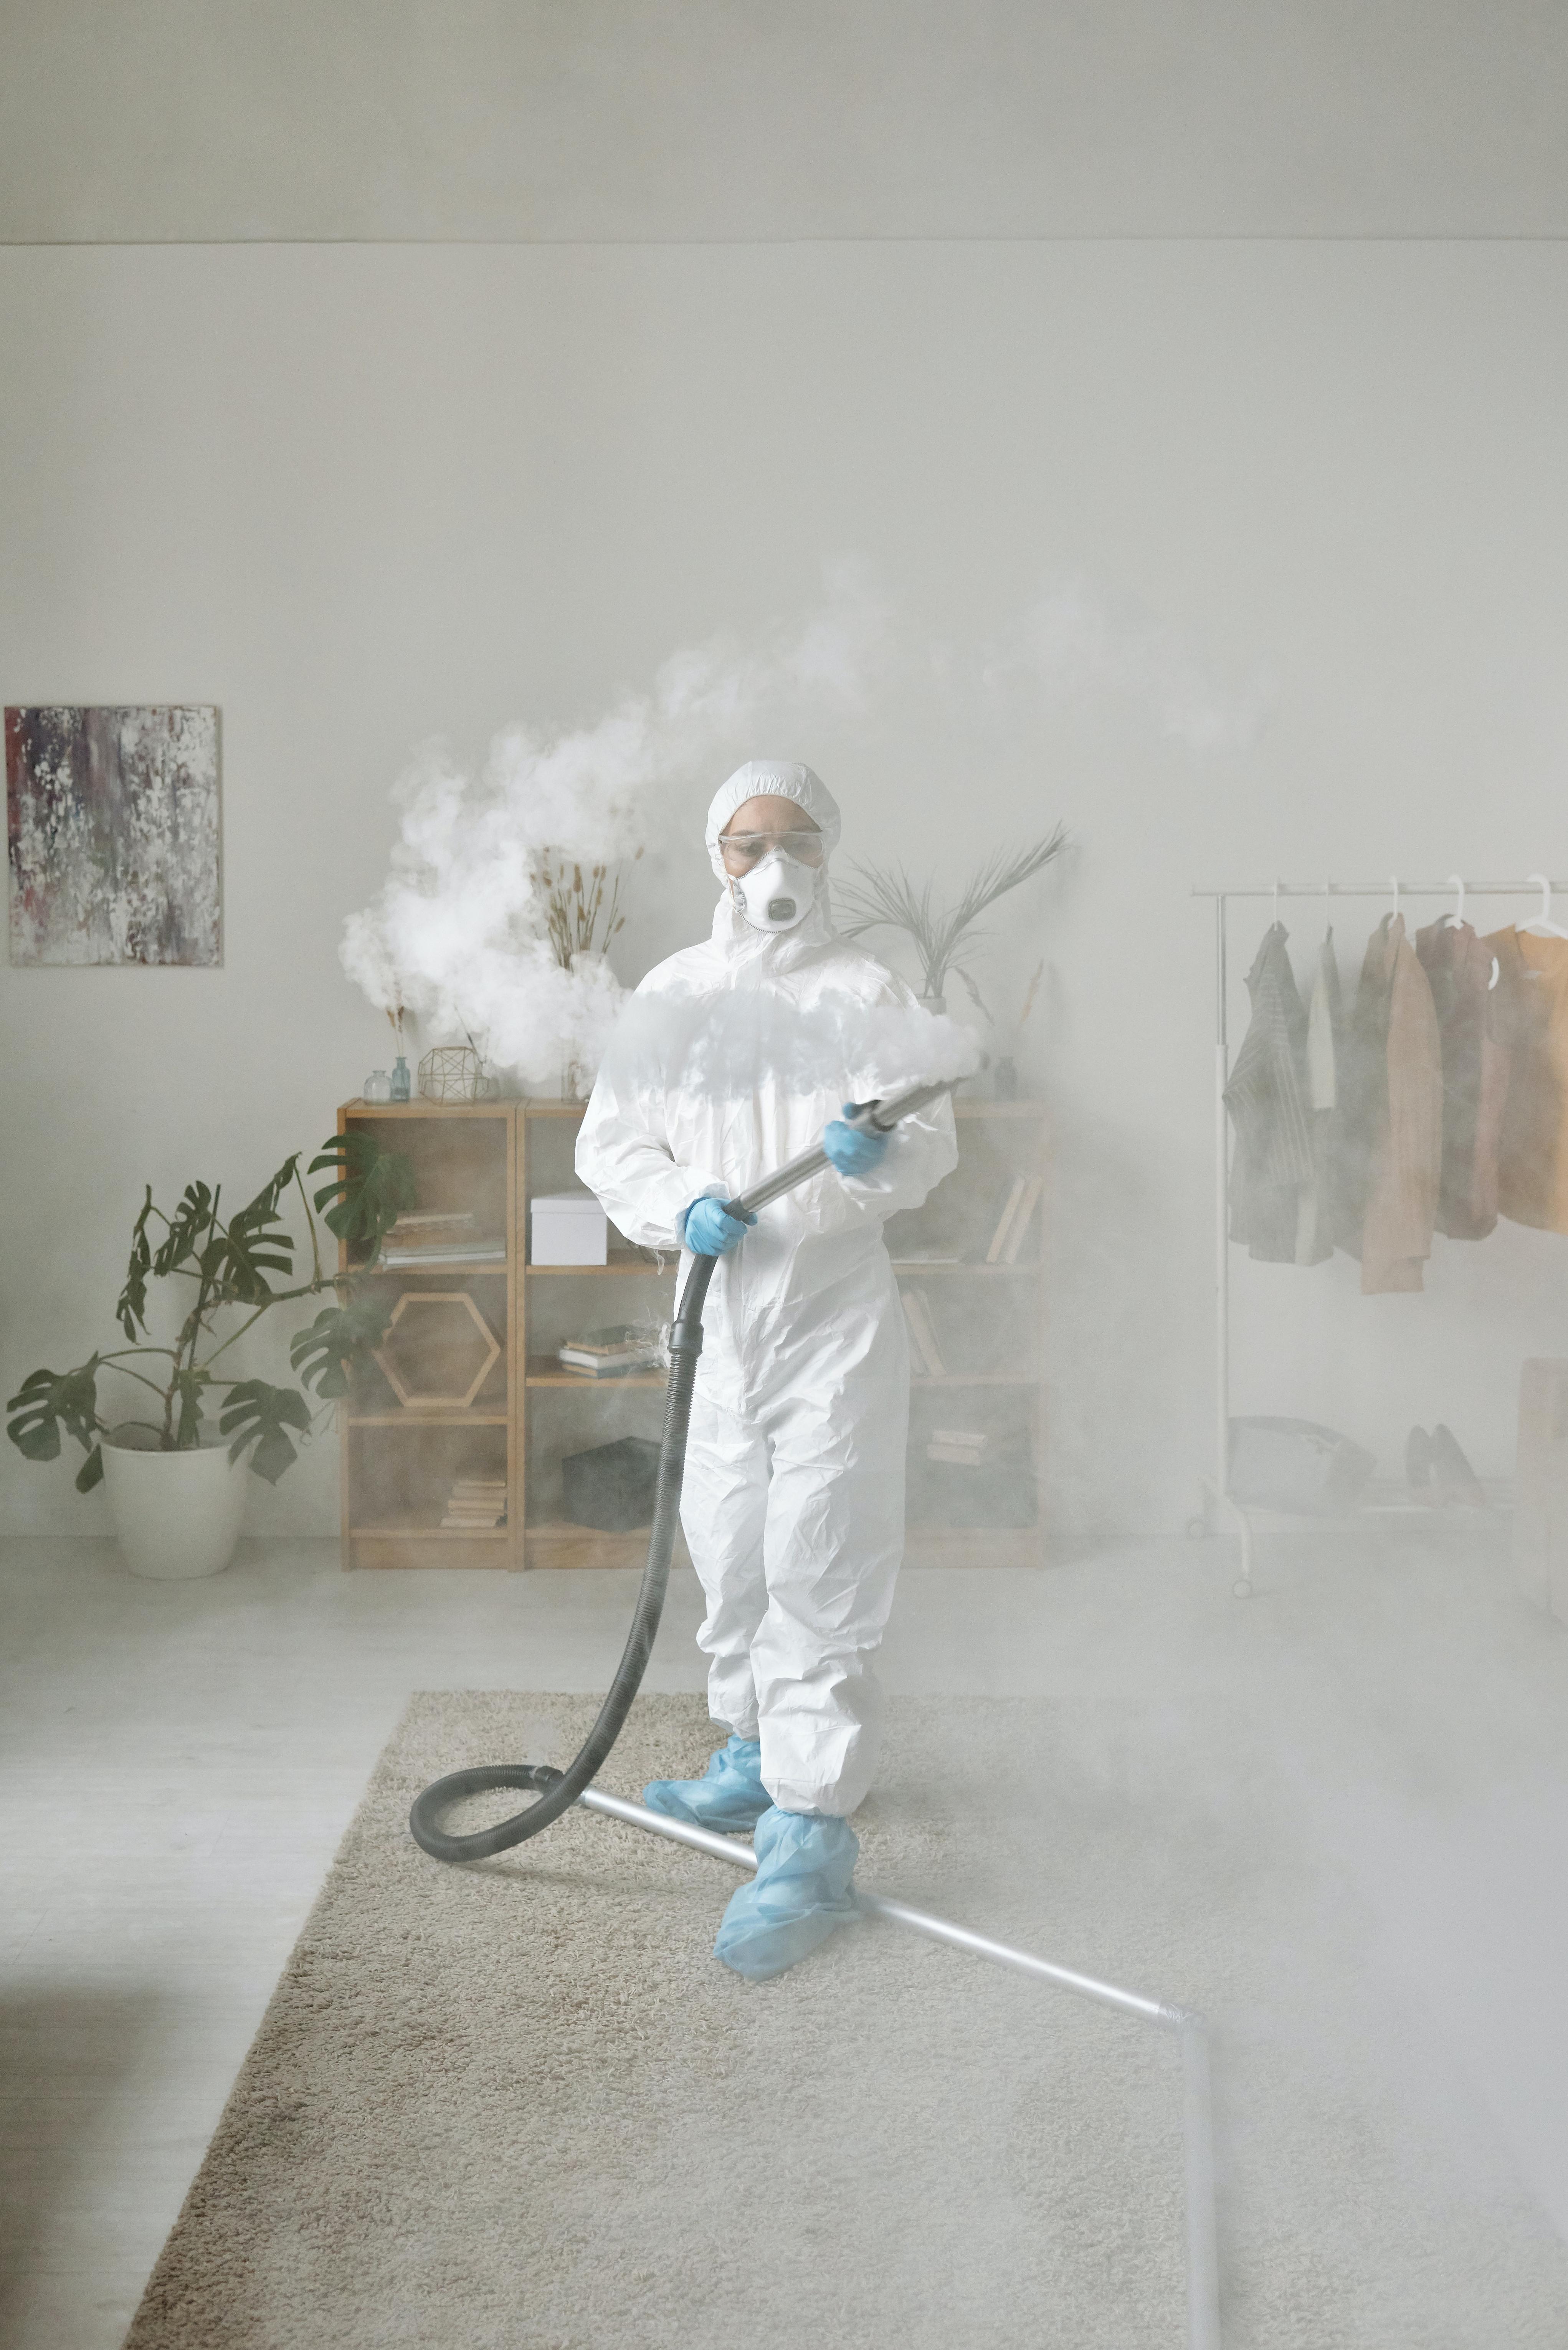 Home Sanitisation - 3BHK